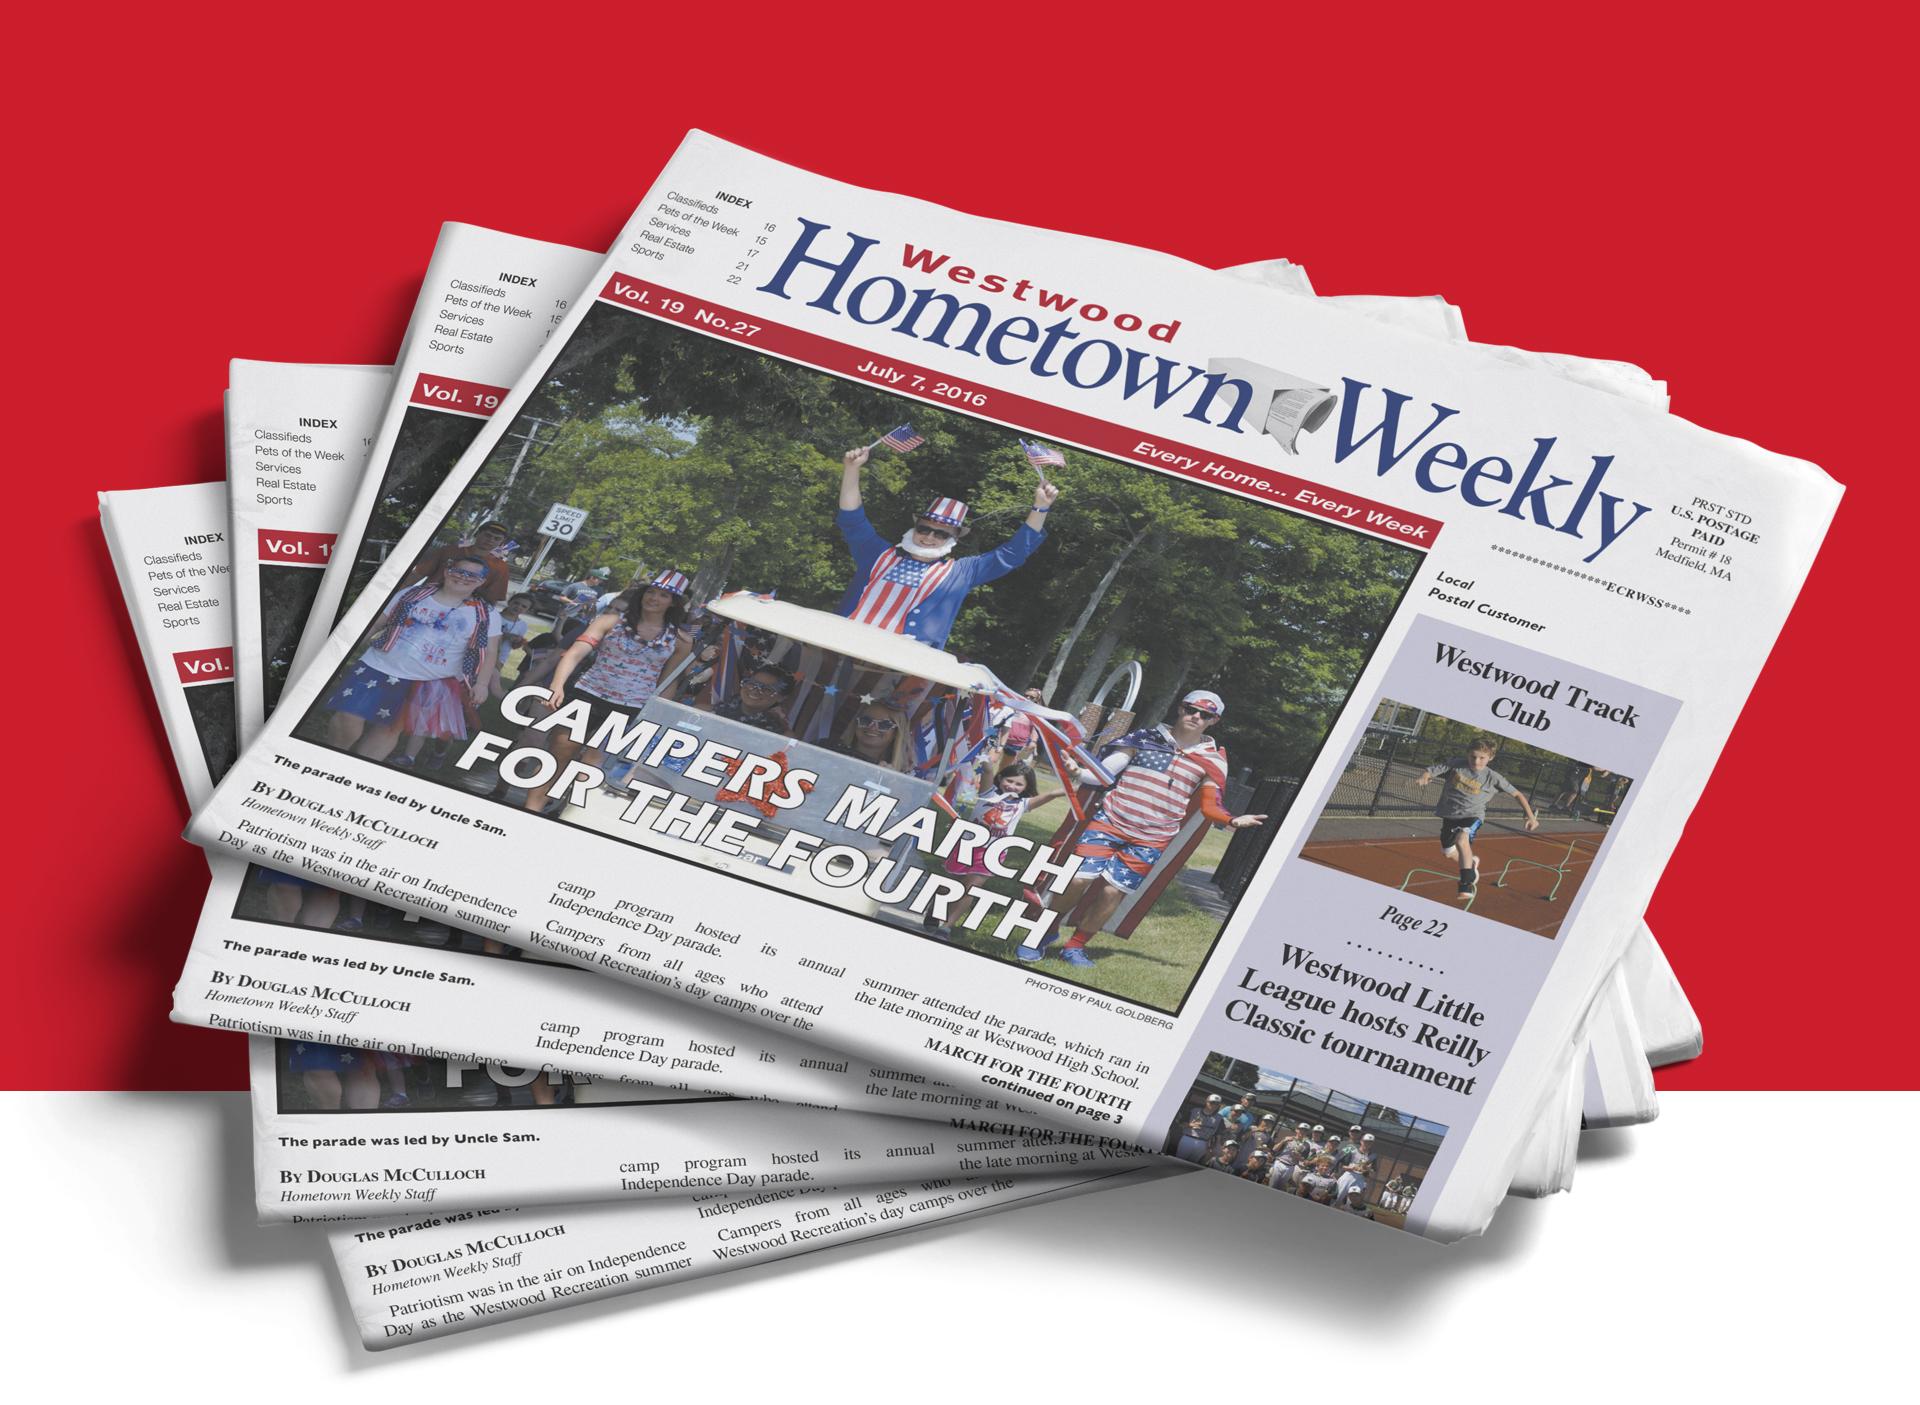 Geena's Matuson's work in layout design for newspaper Hometown Publications, LLC.